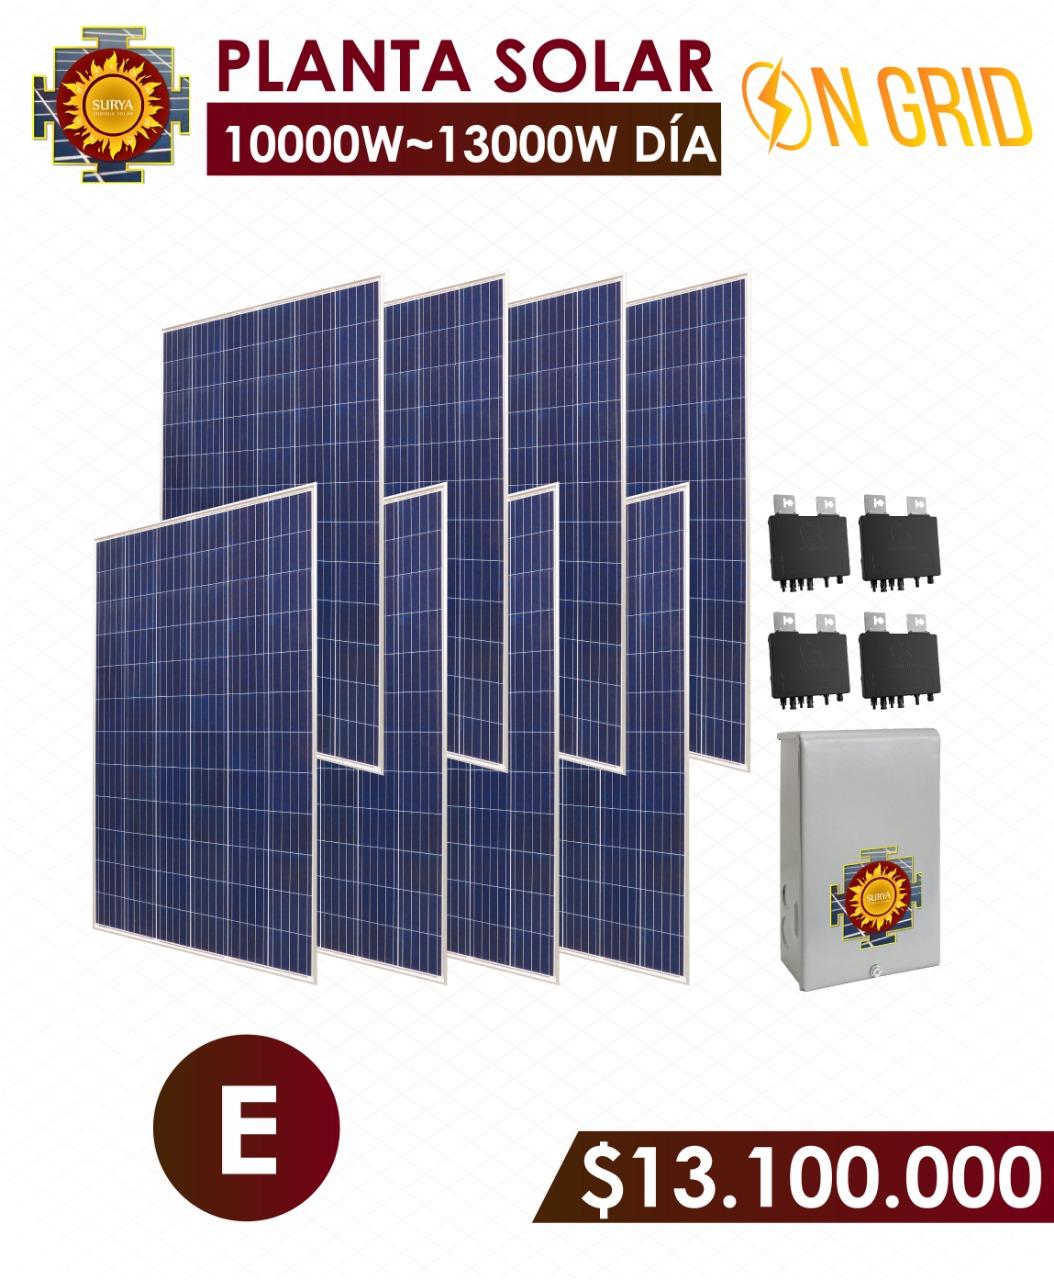 planta solar inyeccion a la red 10000 watts a 1300watts al dia